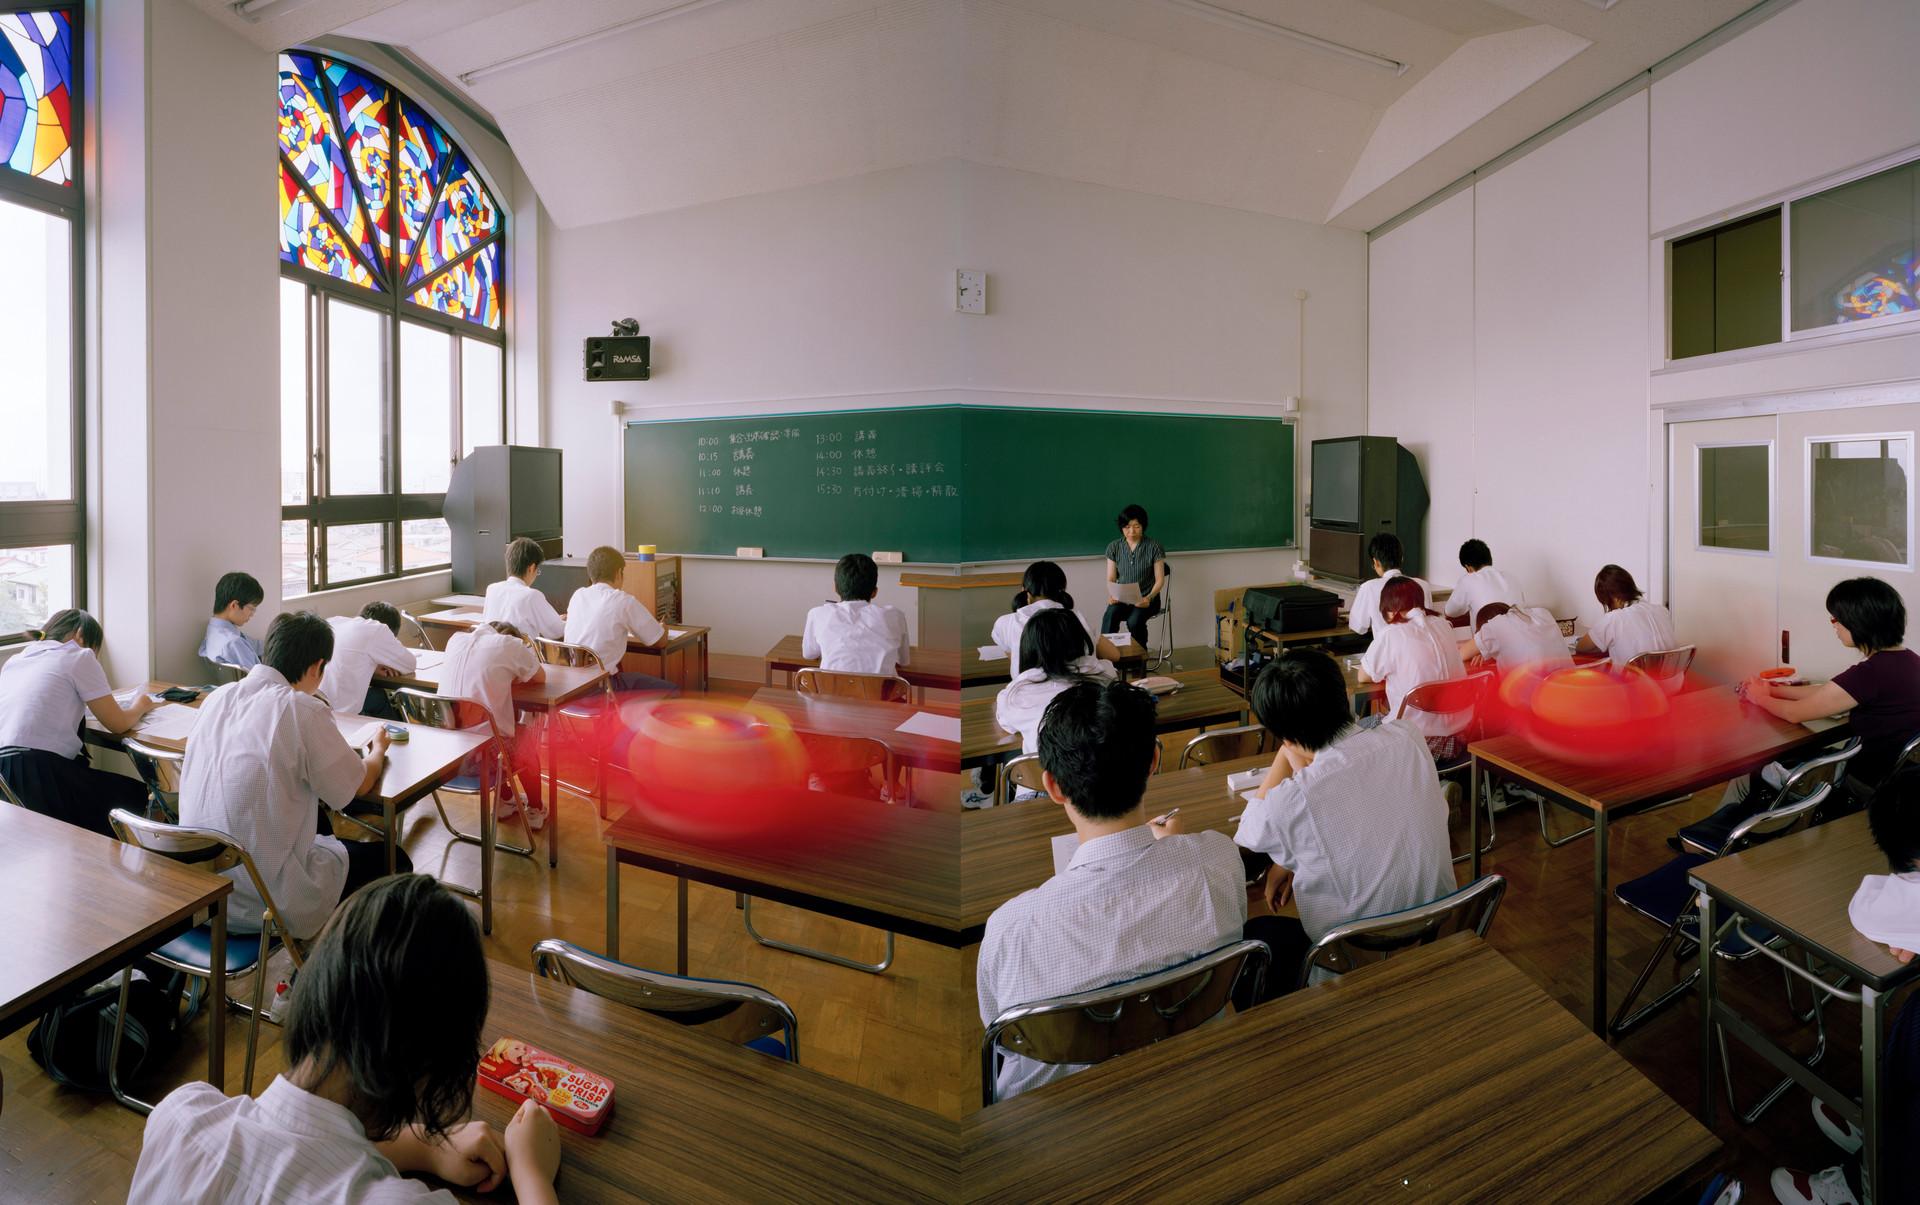 Tsuruoka-kita High School Yamagata